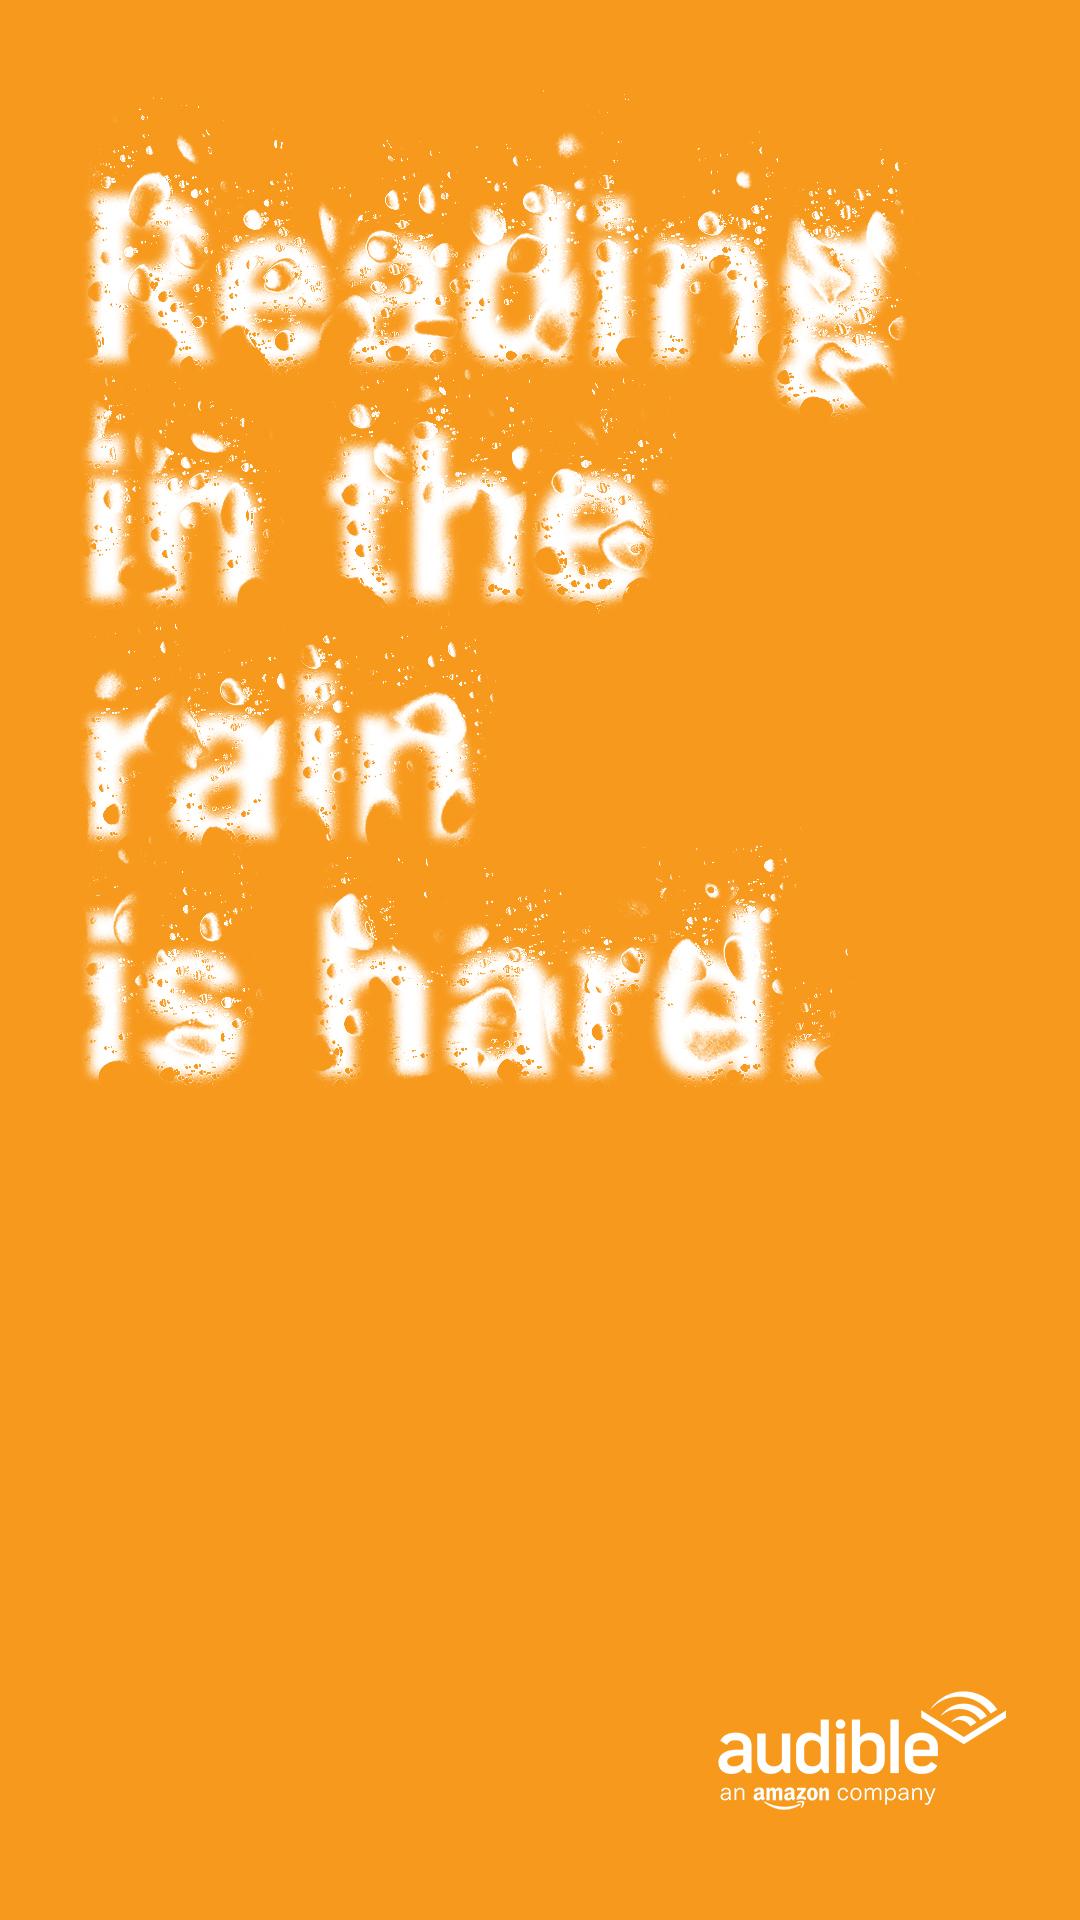 Audible_OOH_Final_Rain 2.jpg